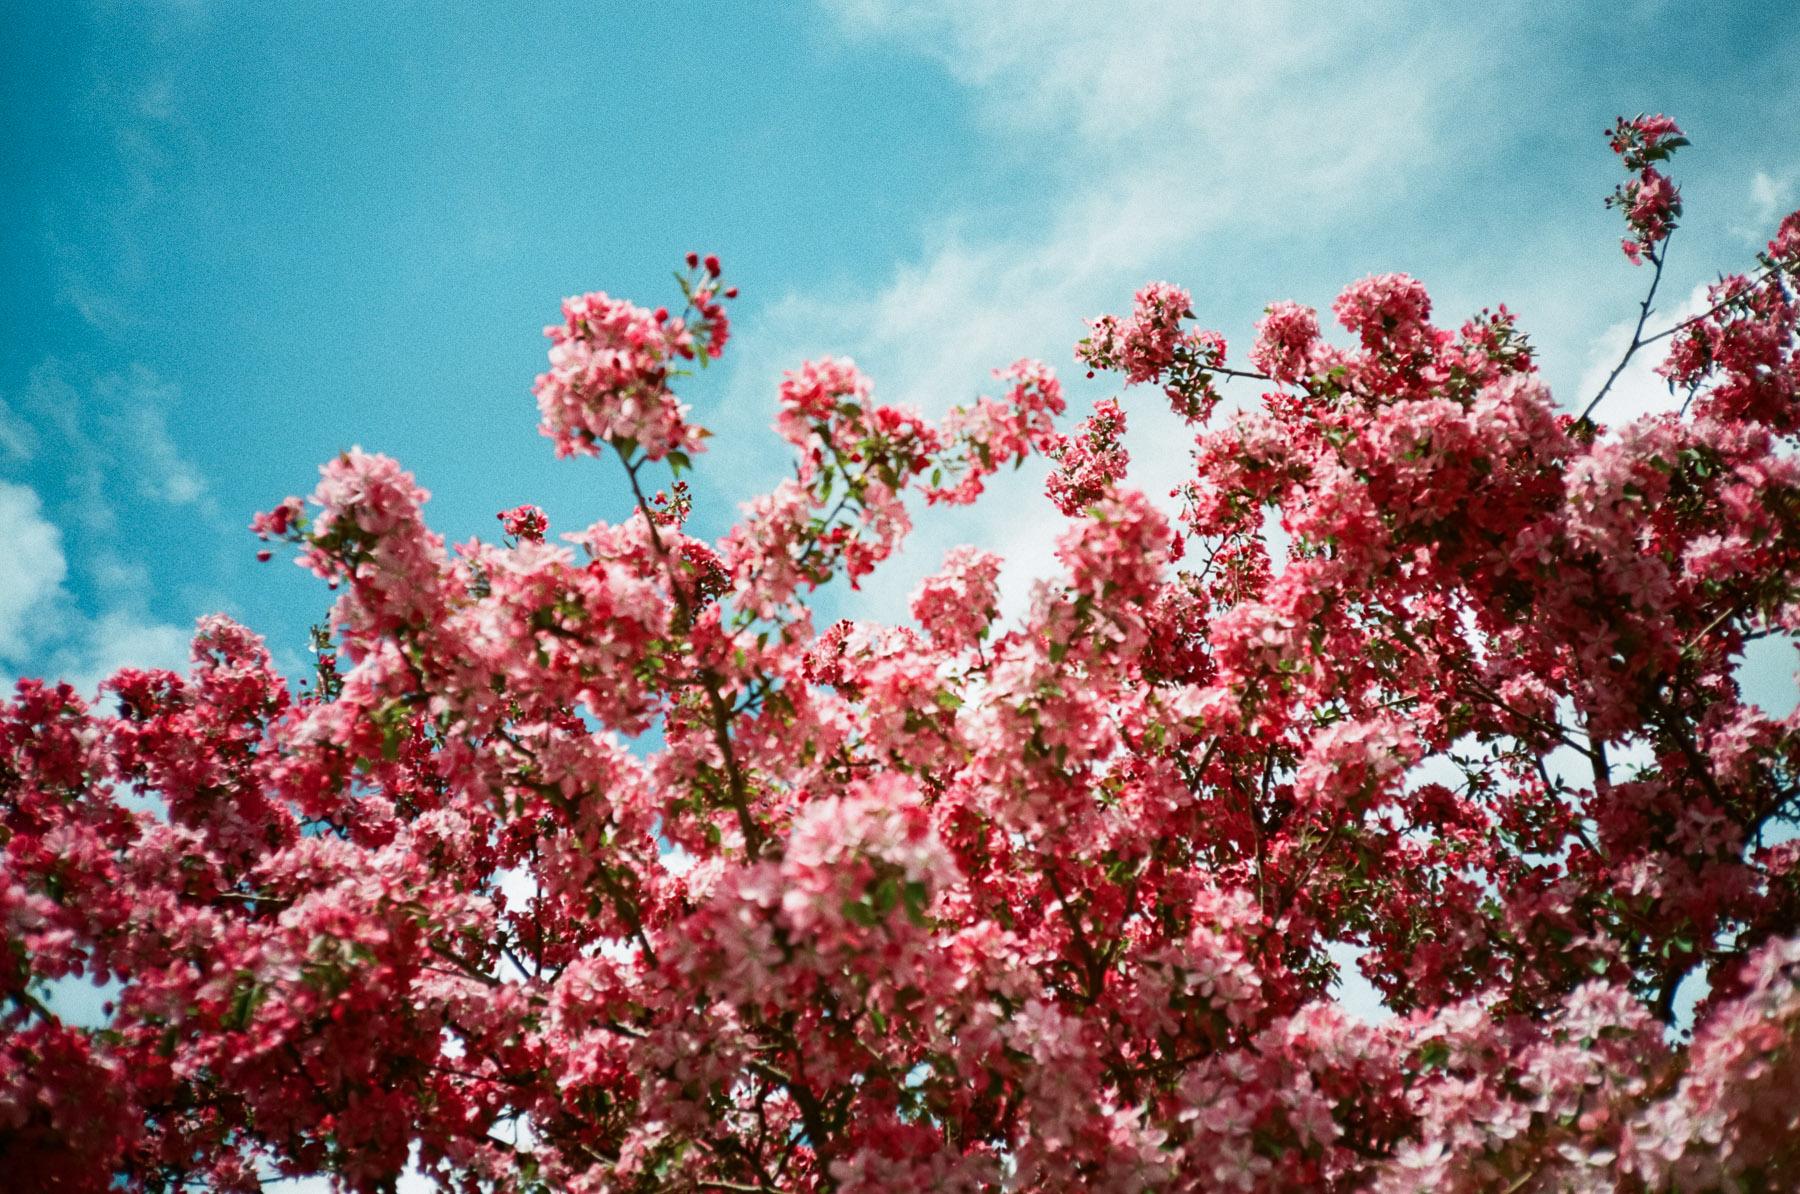 Blooming flowers and blue skies mean summer has arrived in Calgary